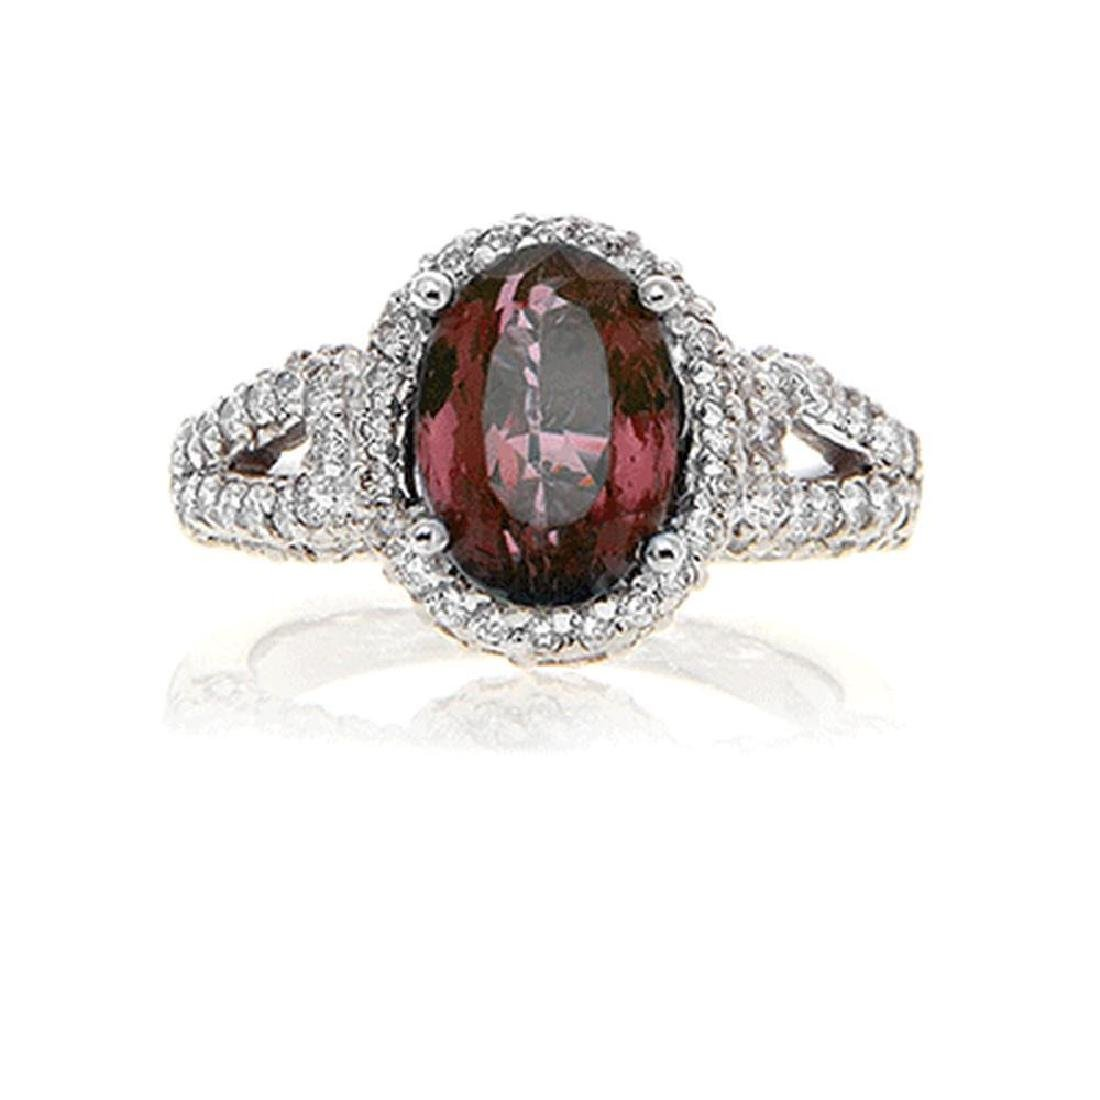 C.DUNAIGRE ALEXANDRITE RING WITH DIAMOND